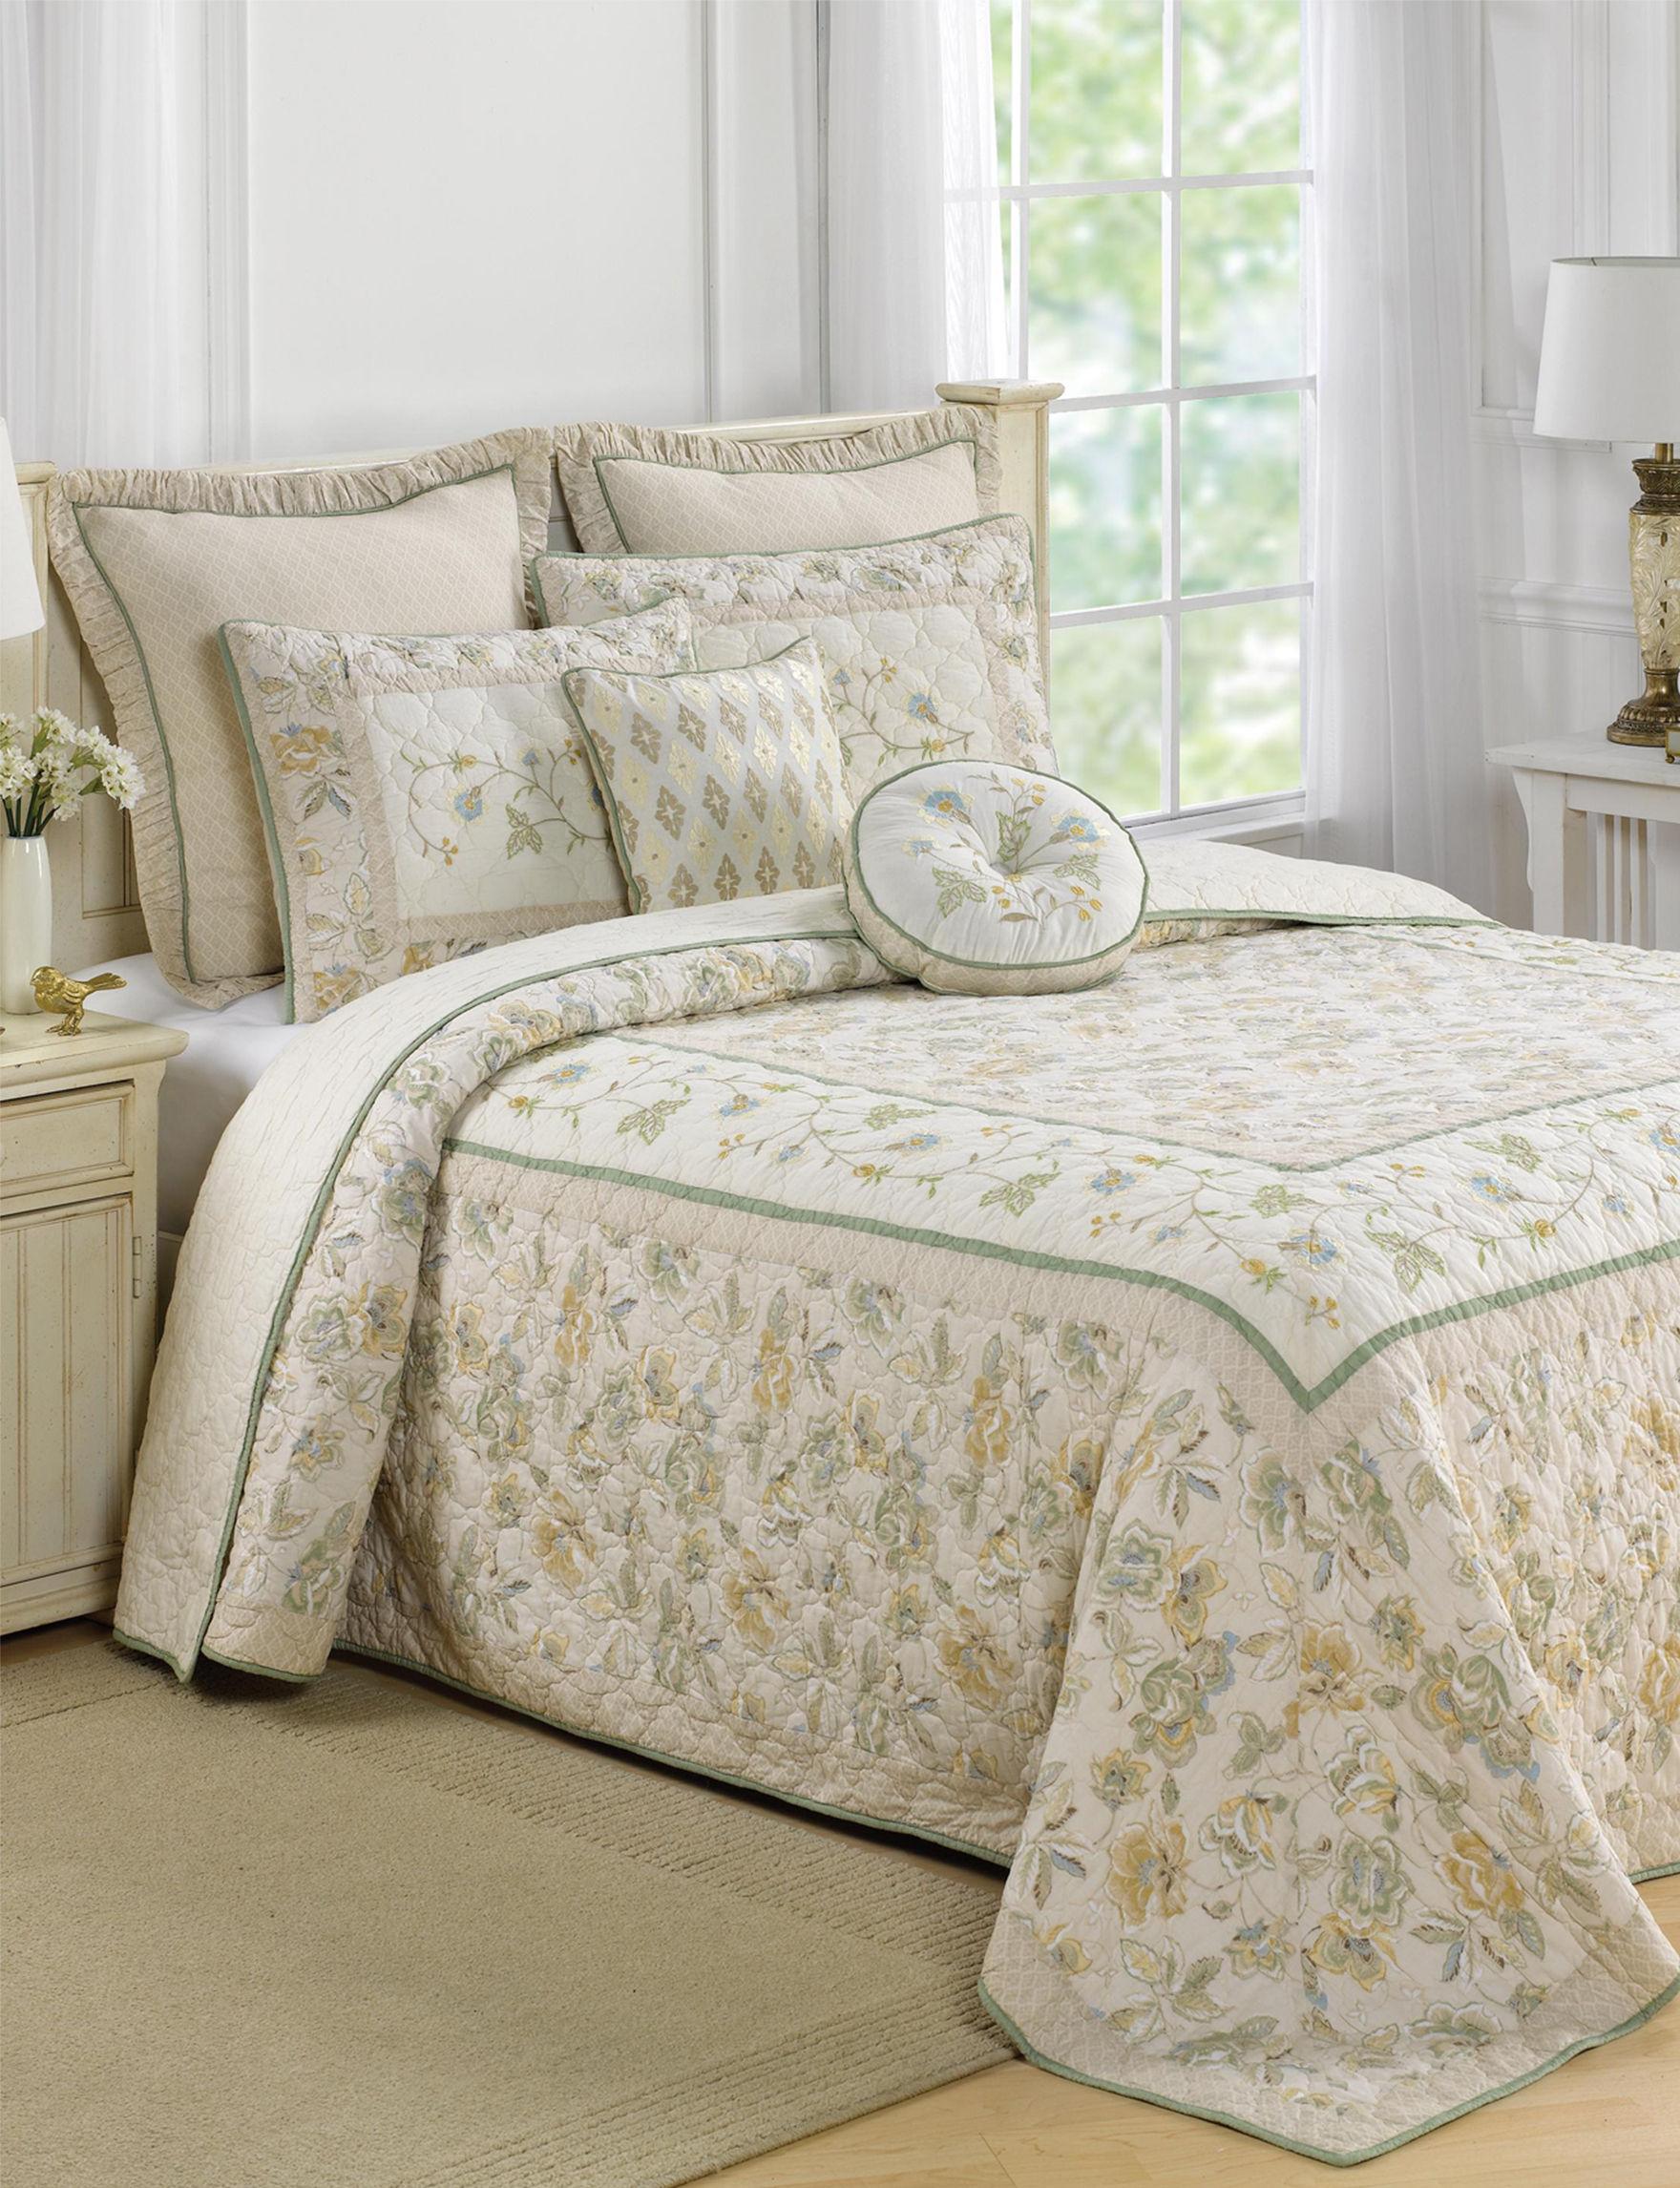 Nostalgia Home Cream Quilts & Quilt Sets